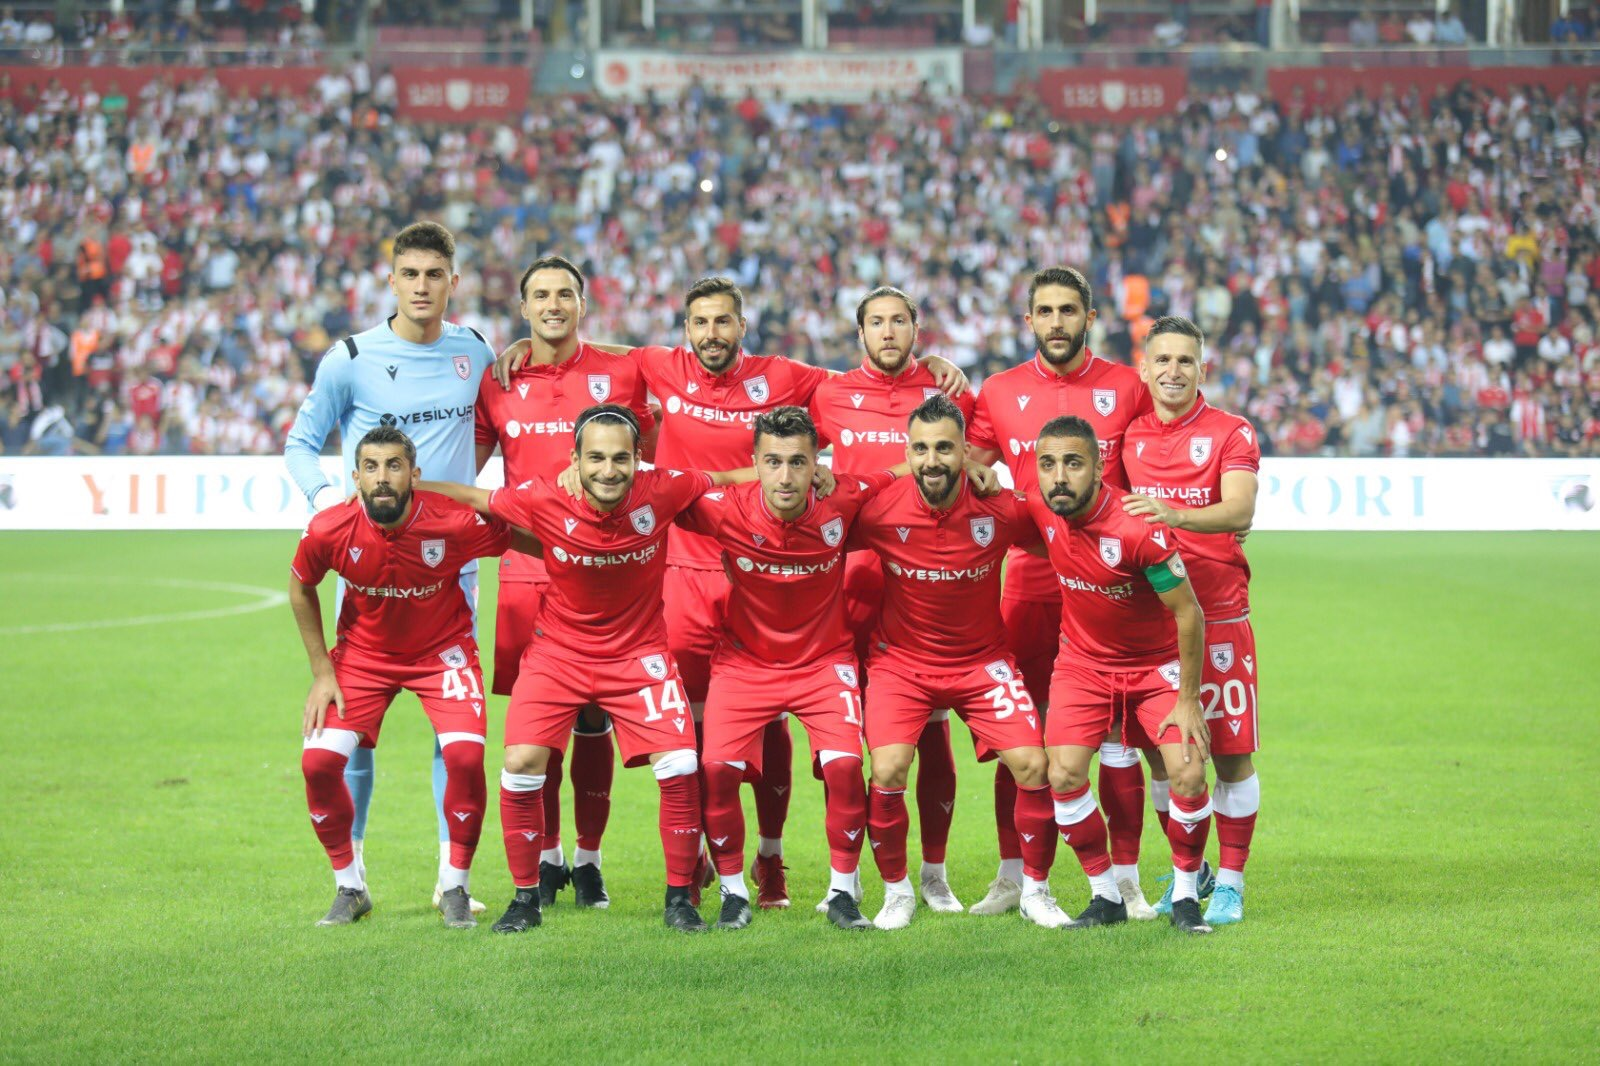 İşte Samsunspor'un İlk 11'i..